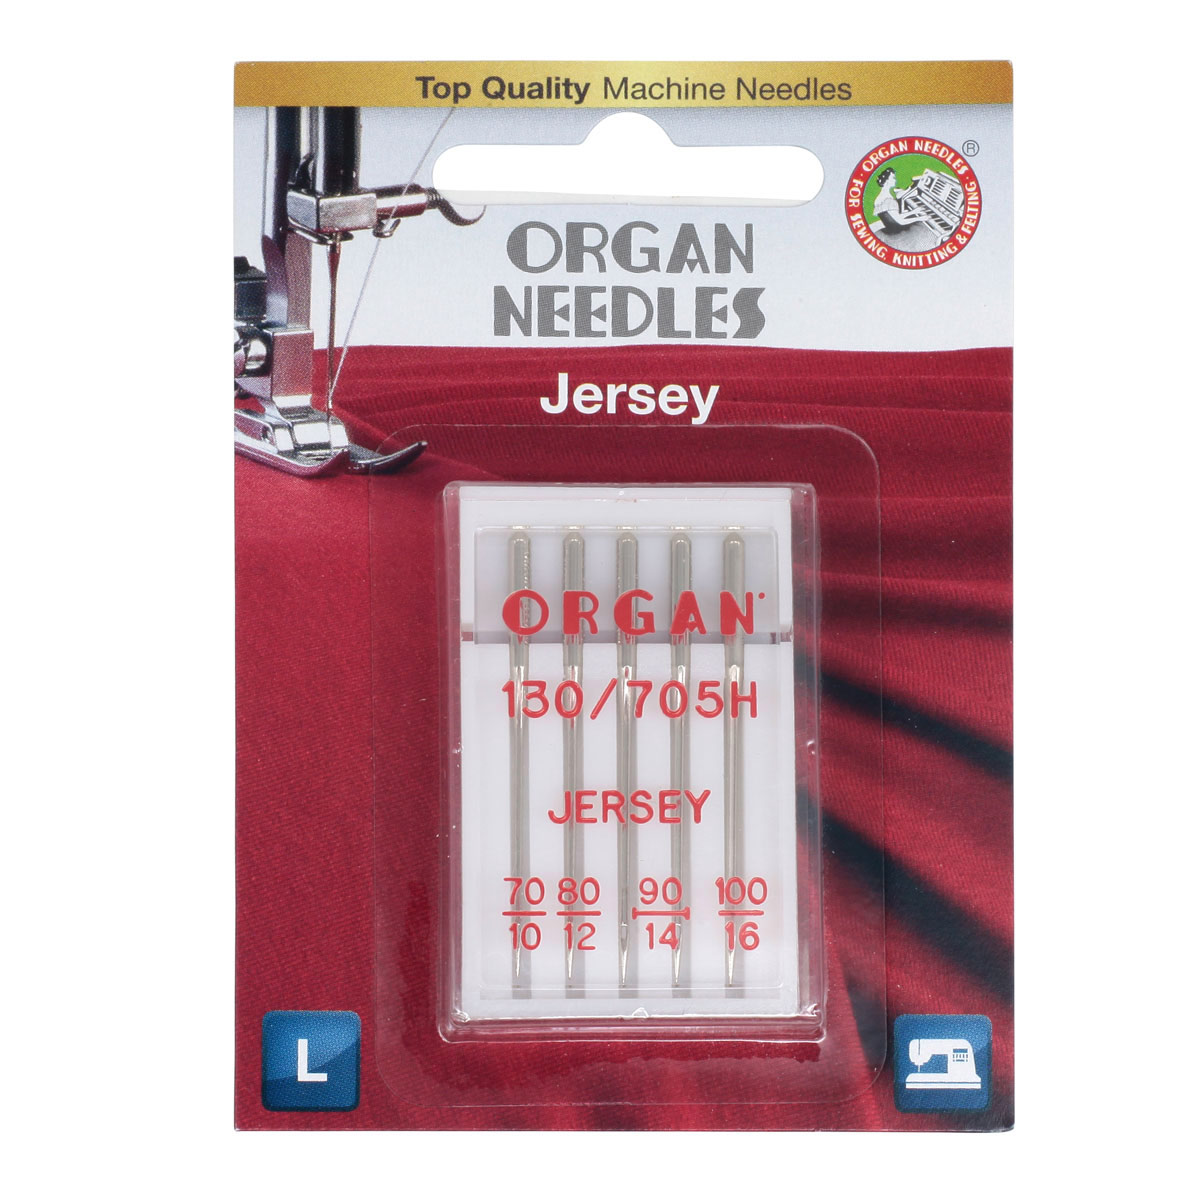 ORGAN иглы джерси 5/70-100 Blister фото